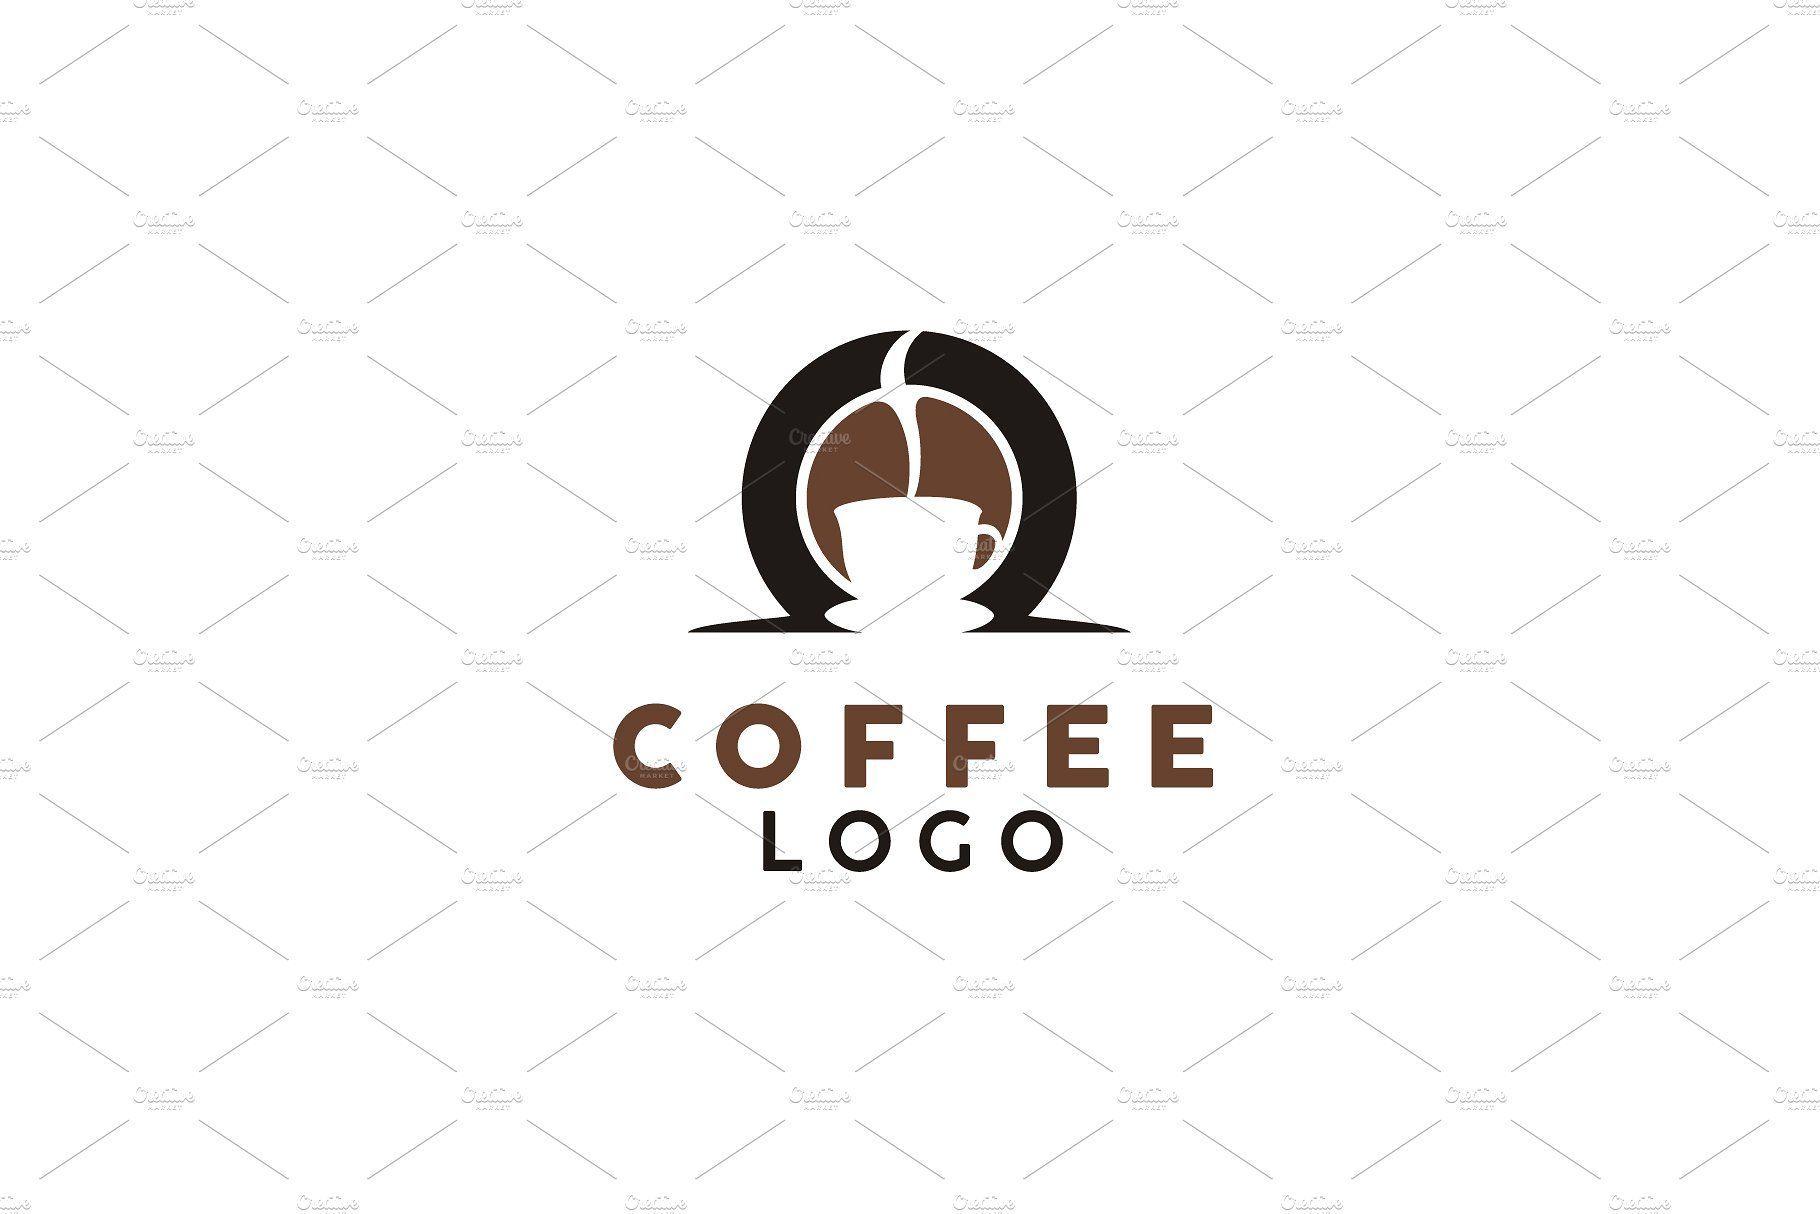 Coffee Bean / Cup logo design logo design coffee drink